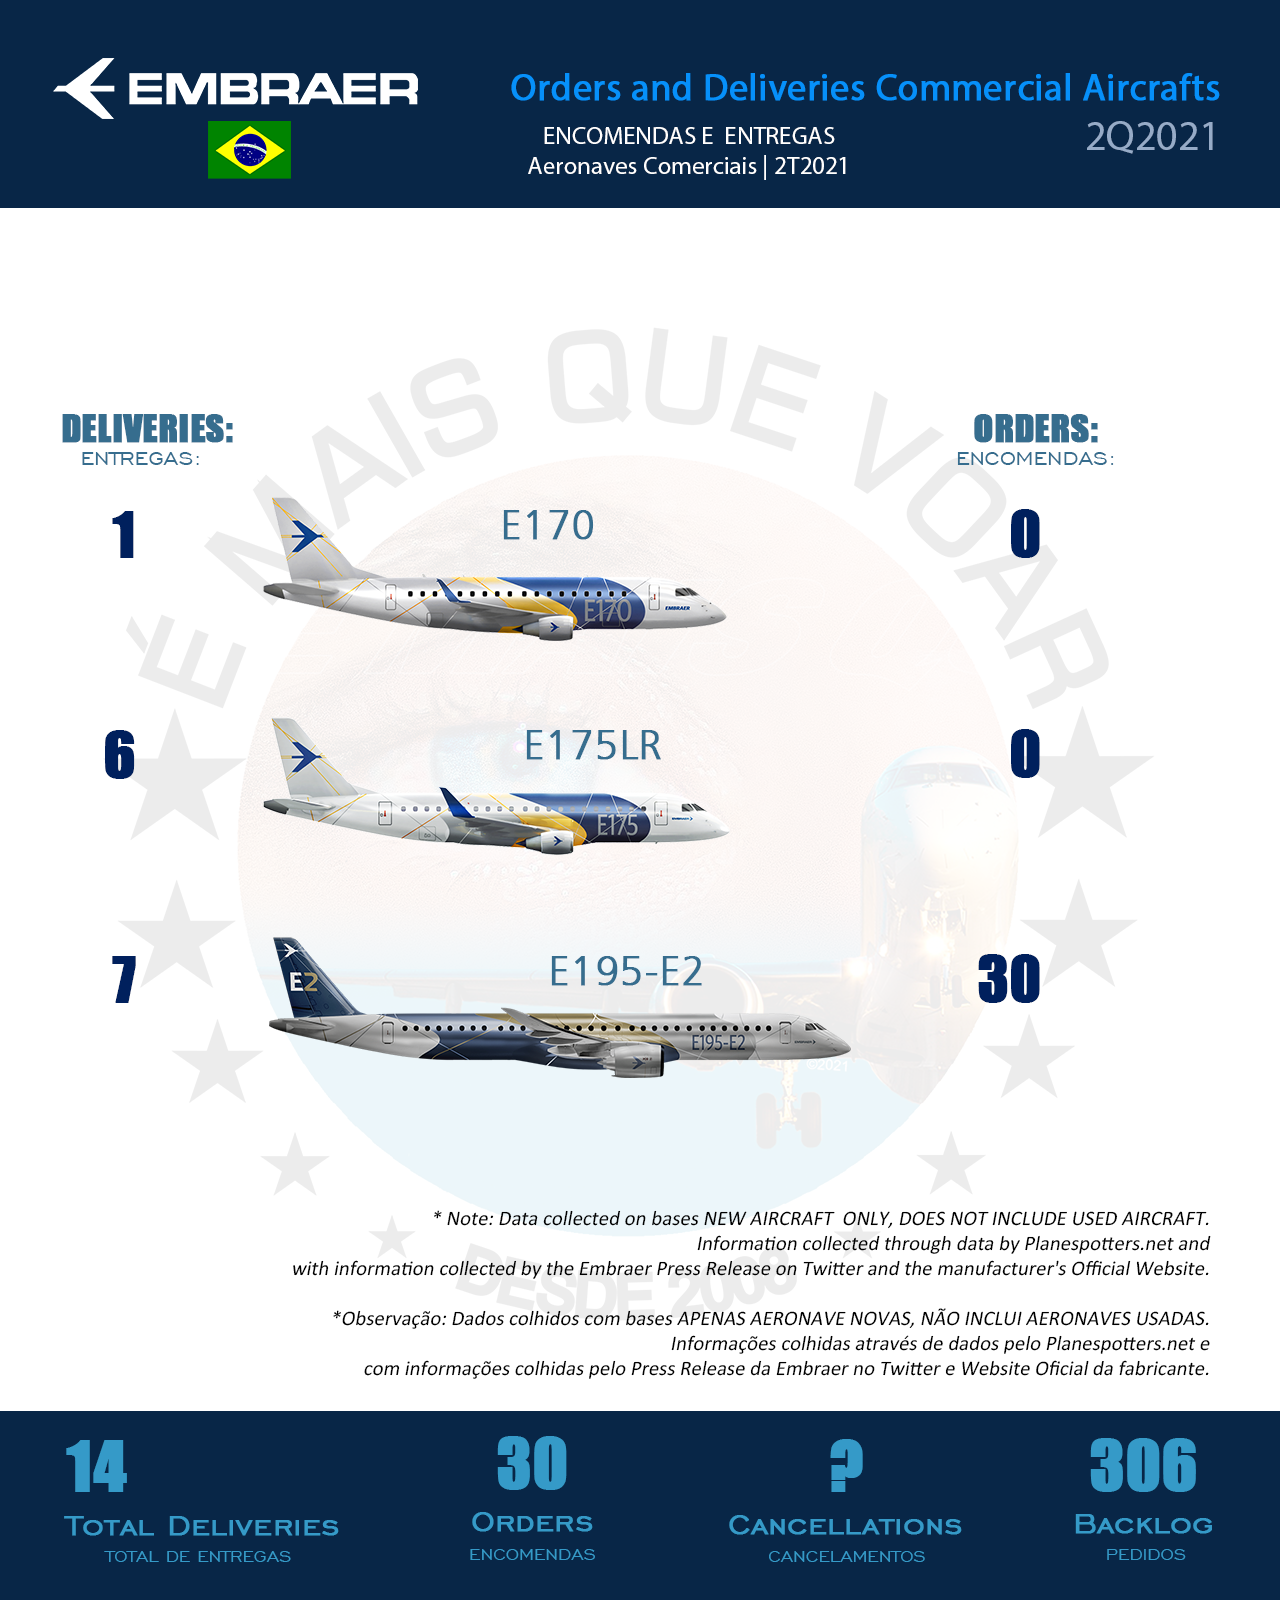 Embraer - encomendas e entregas de aeronaves no Segundo Trimestre de 2021 (2T2021)